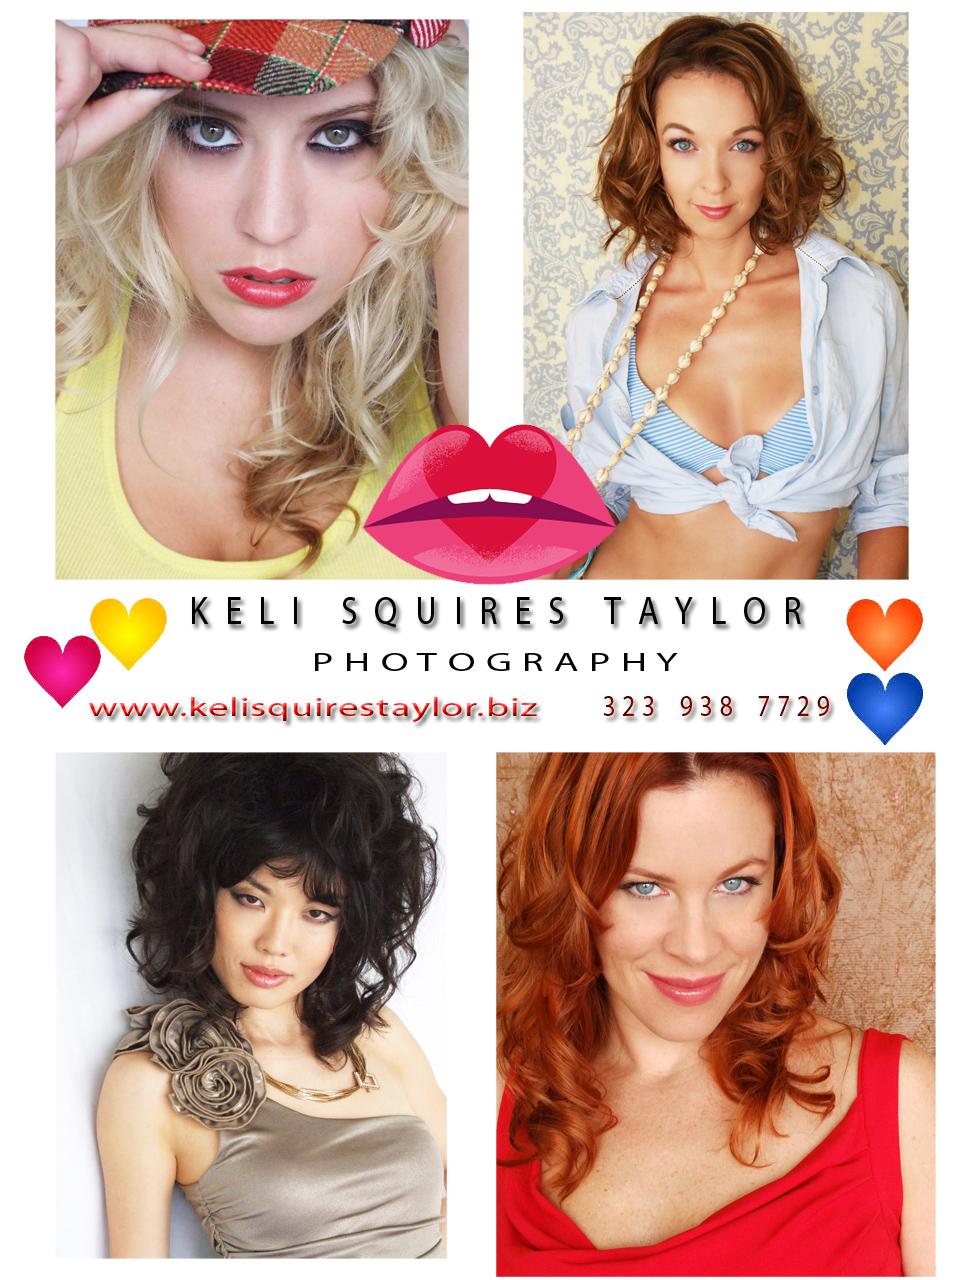 Valentines_Women post 02-10-10- KST.jpg